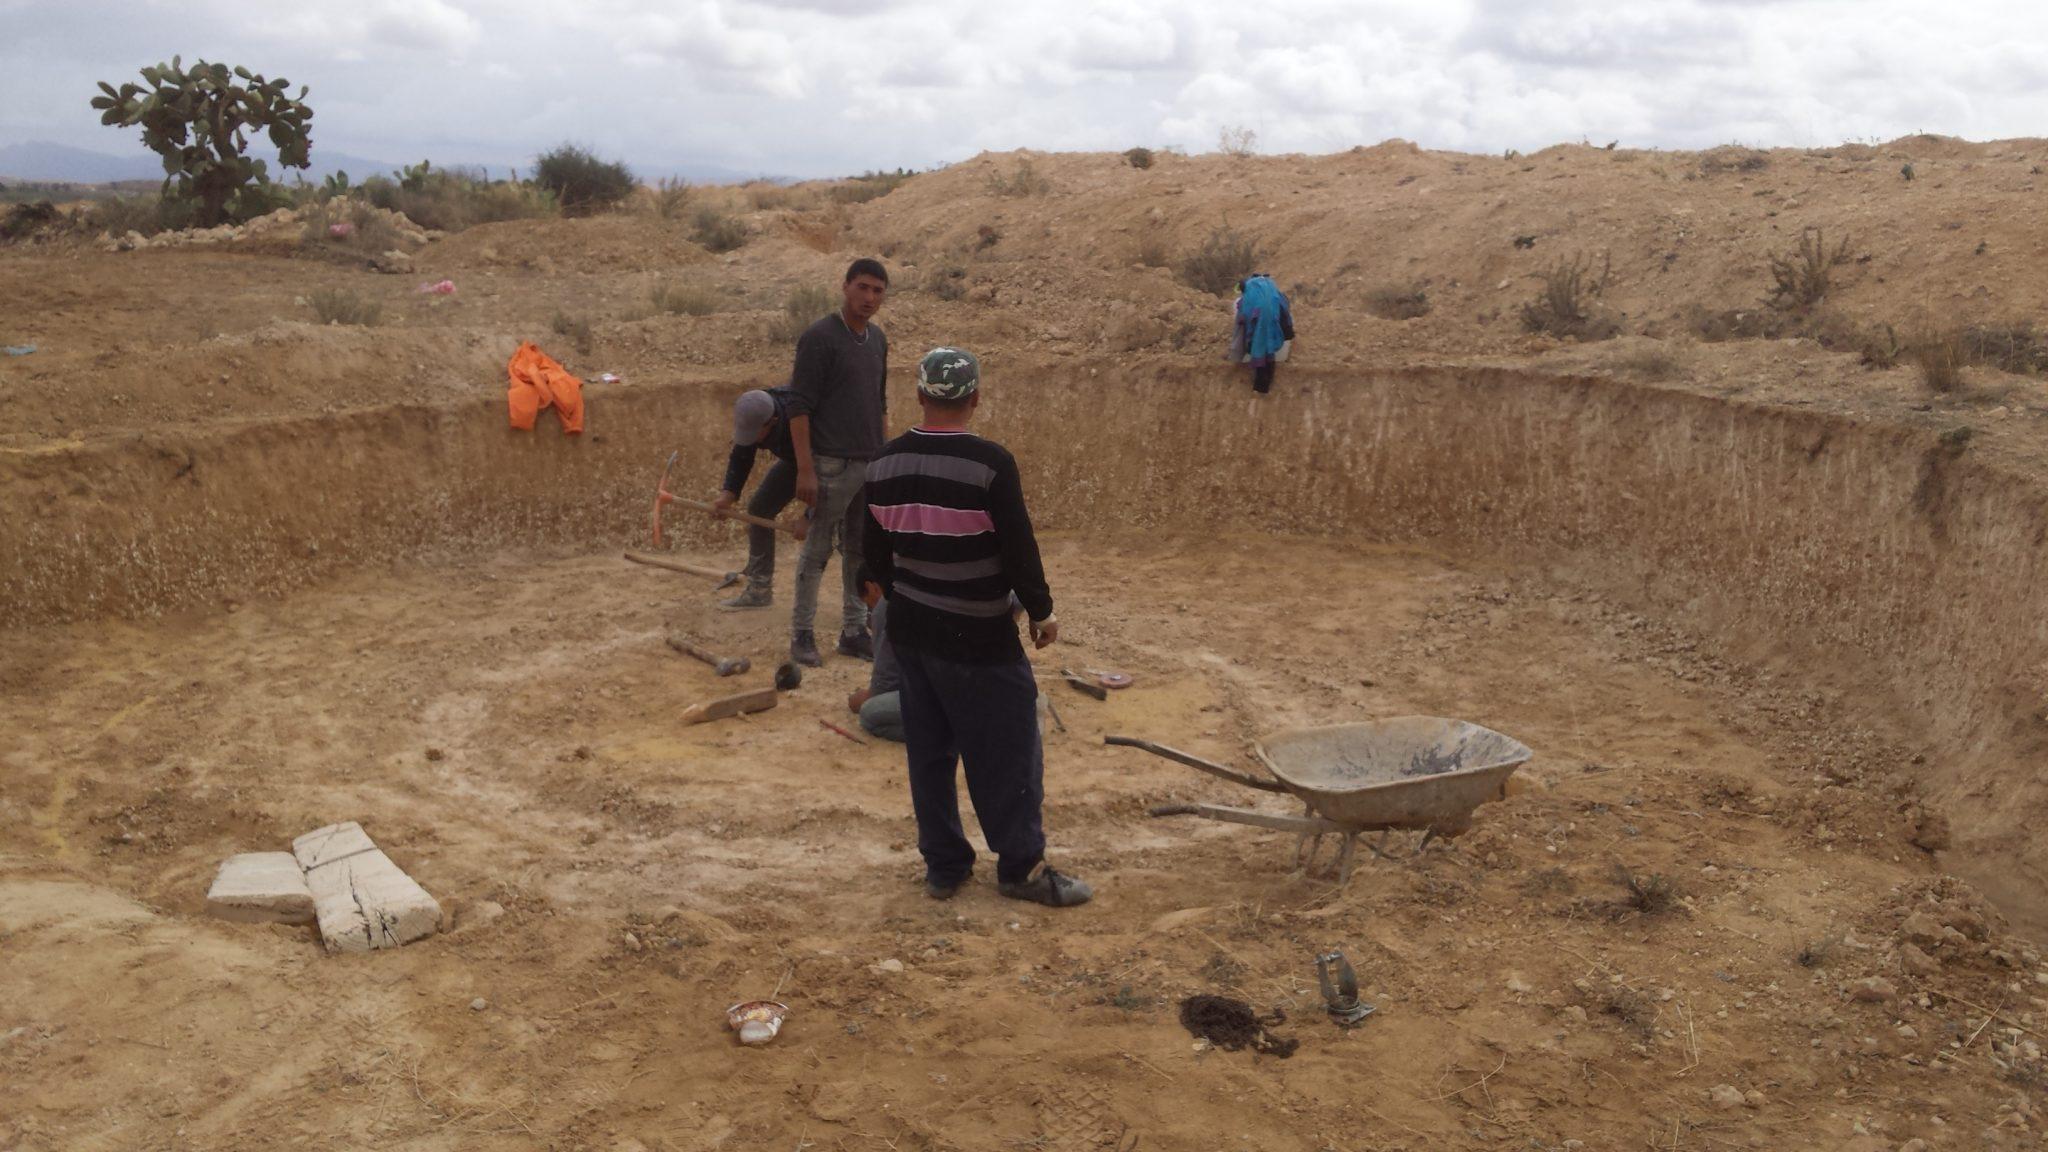 Fondations Hammam Superadobe dôme Tunisie